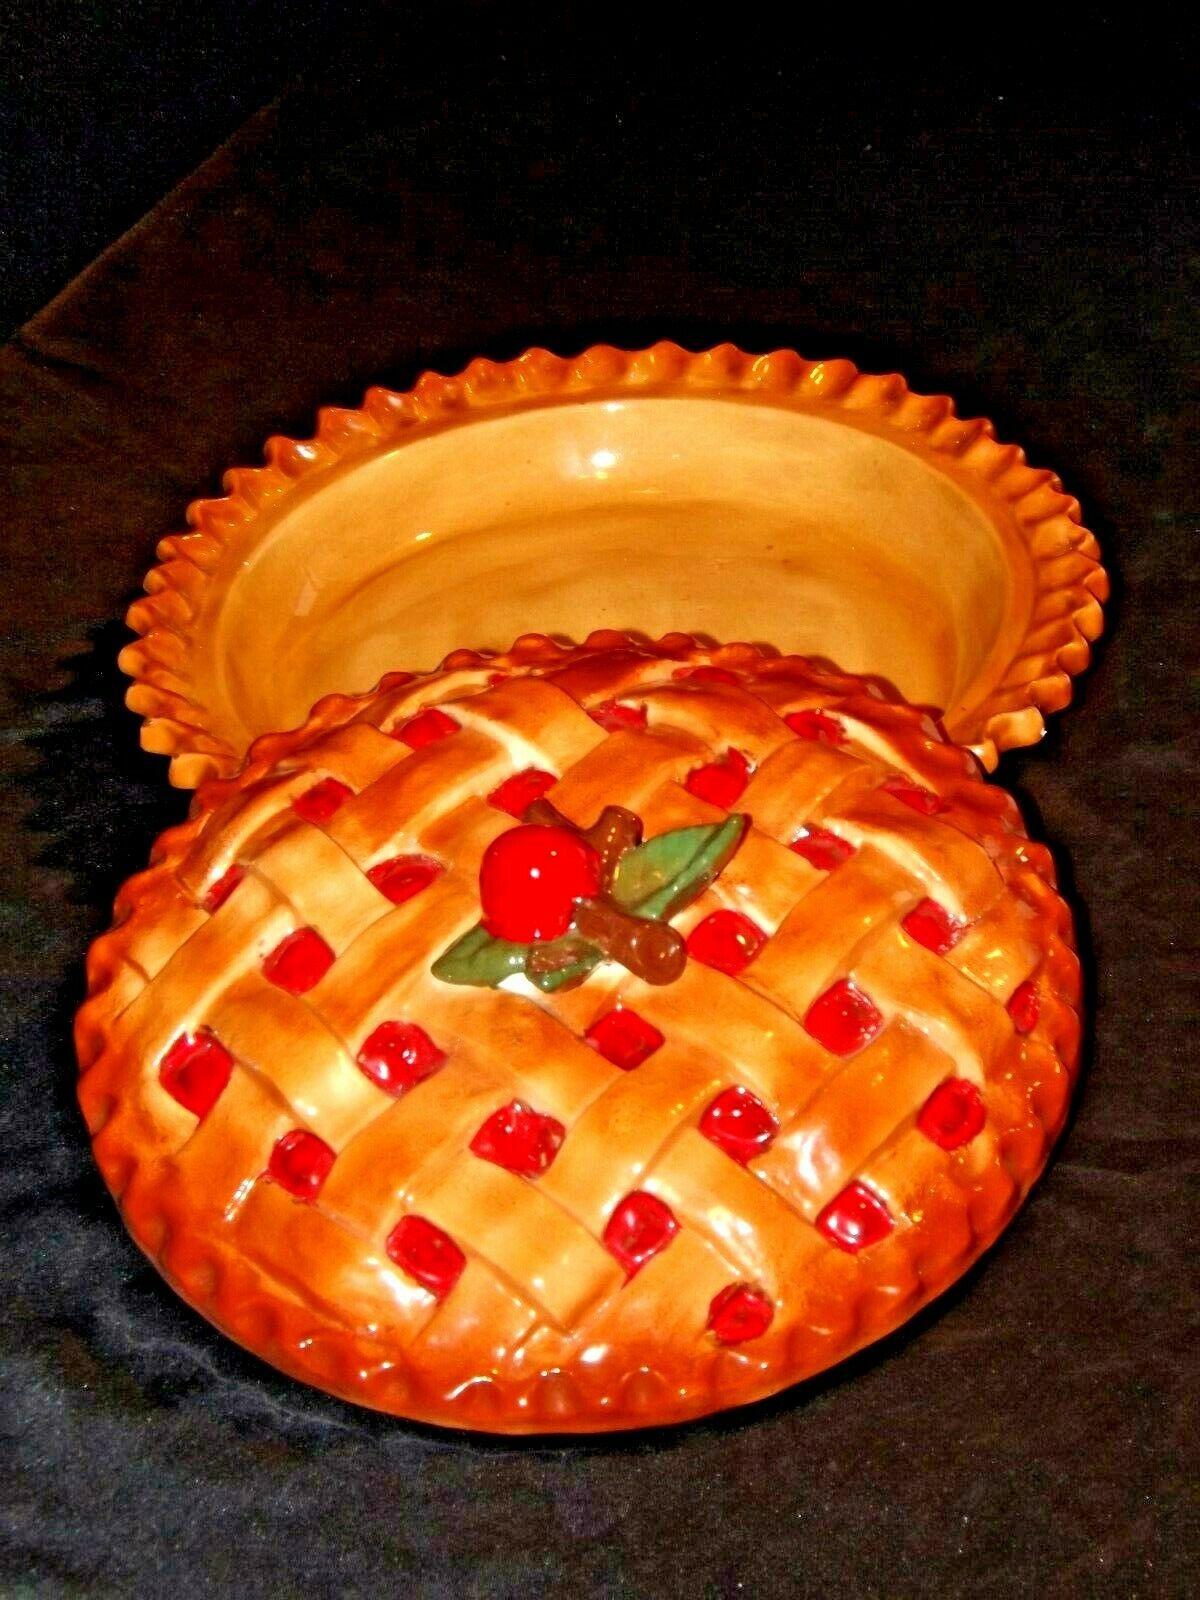 Stoneware Cherry Pie Keep Baking Dish with Decorative Lid AA19-1457